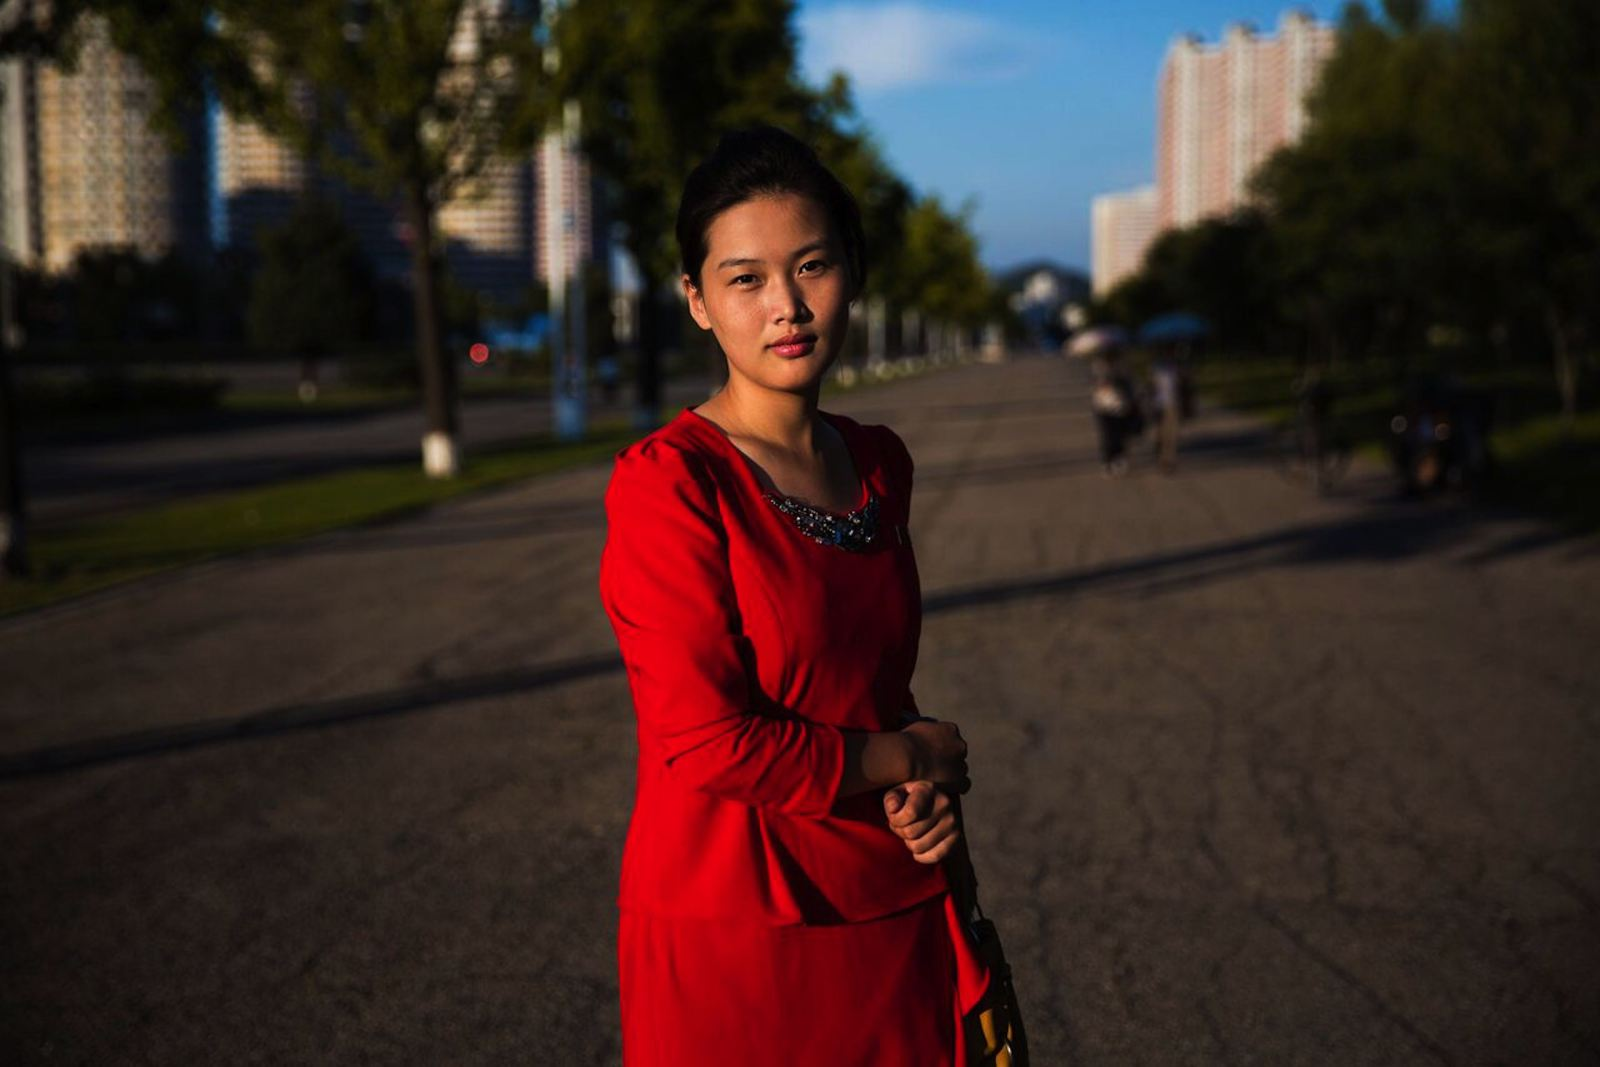 beauty photographer captures female north korea